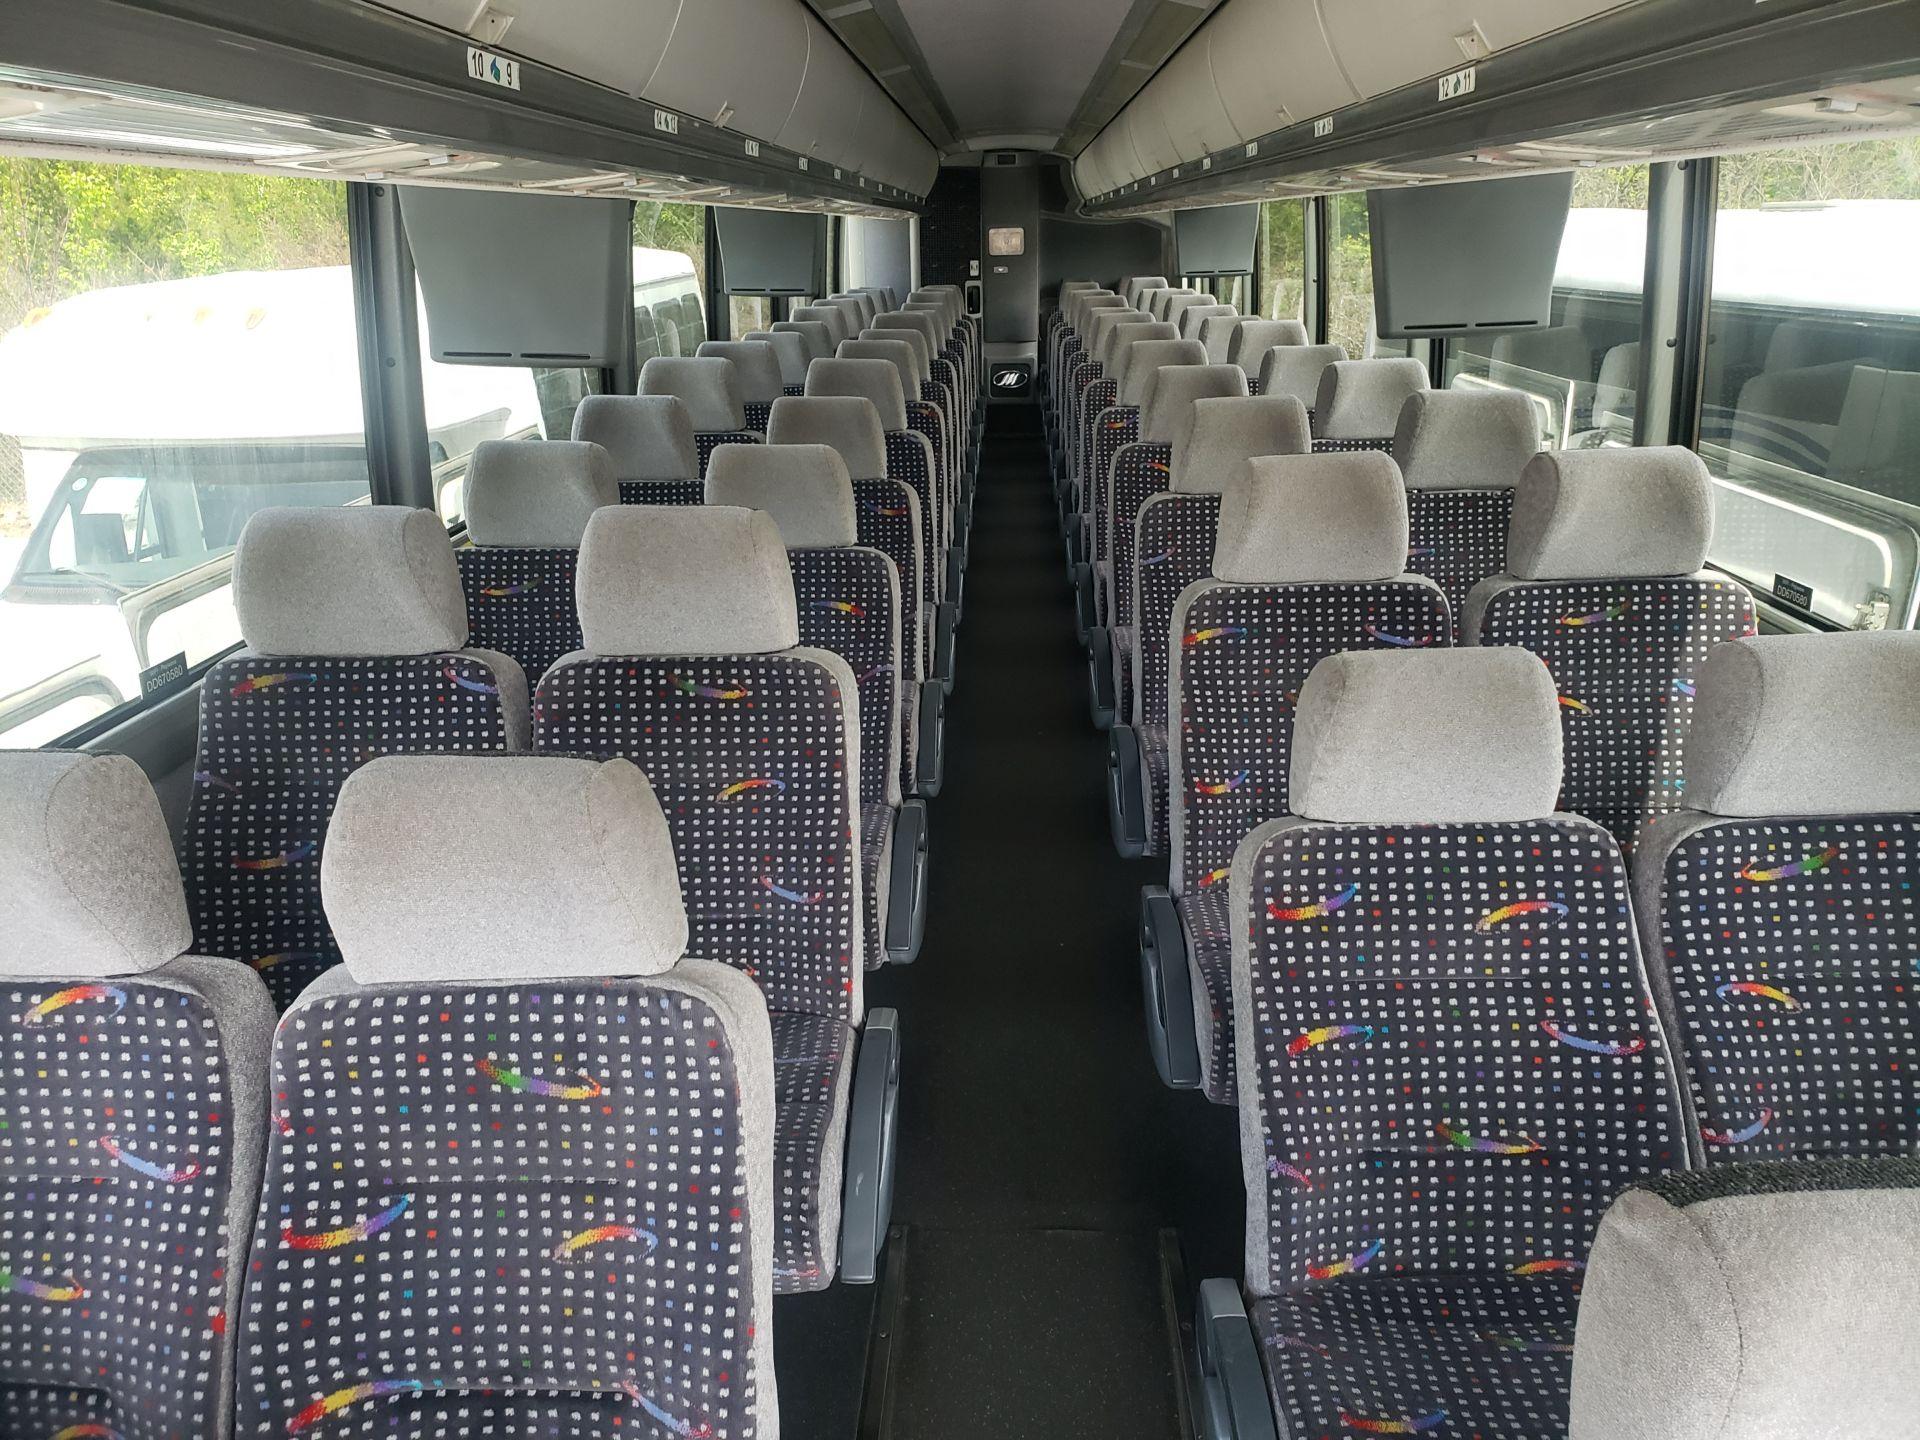 2010 MCI J4500 56-Pass Kneeling Coach Bus - Image 7 of 16